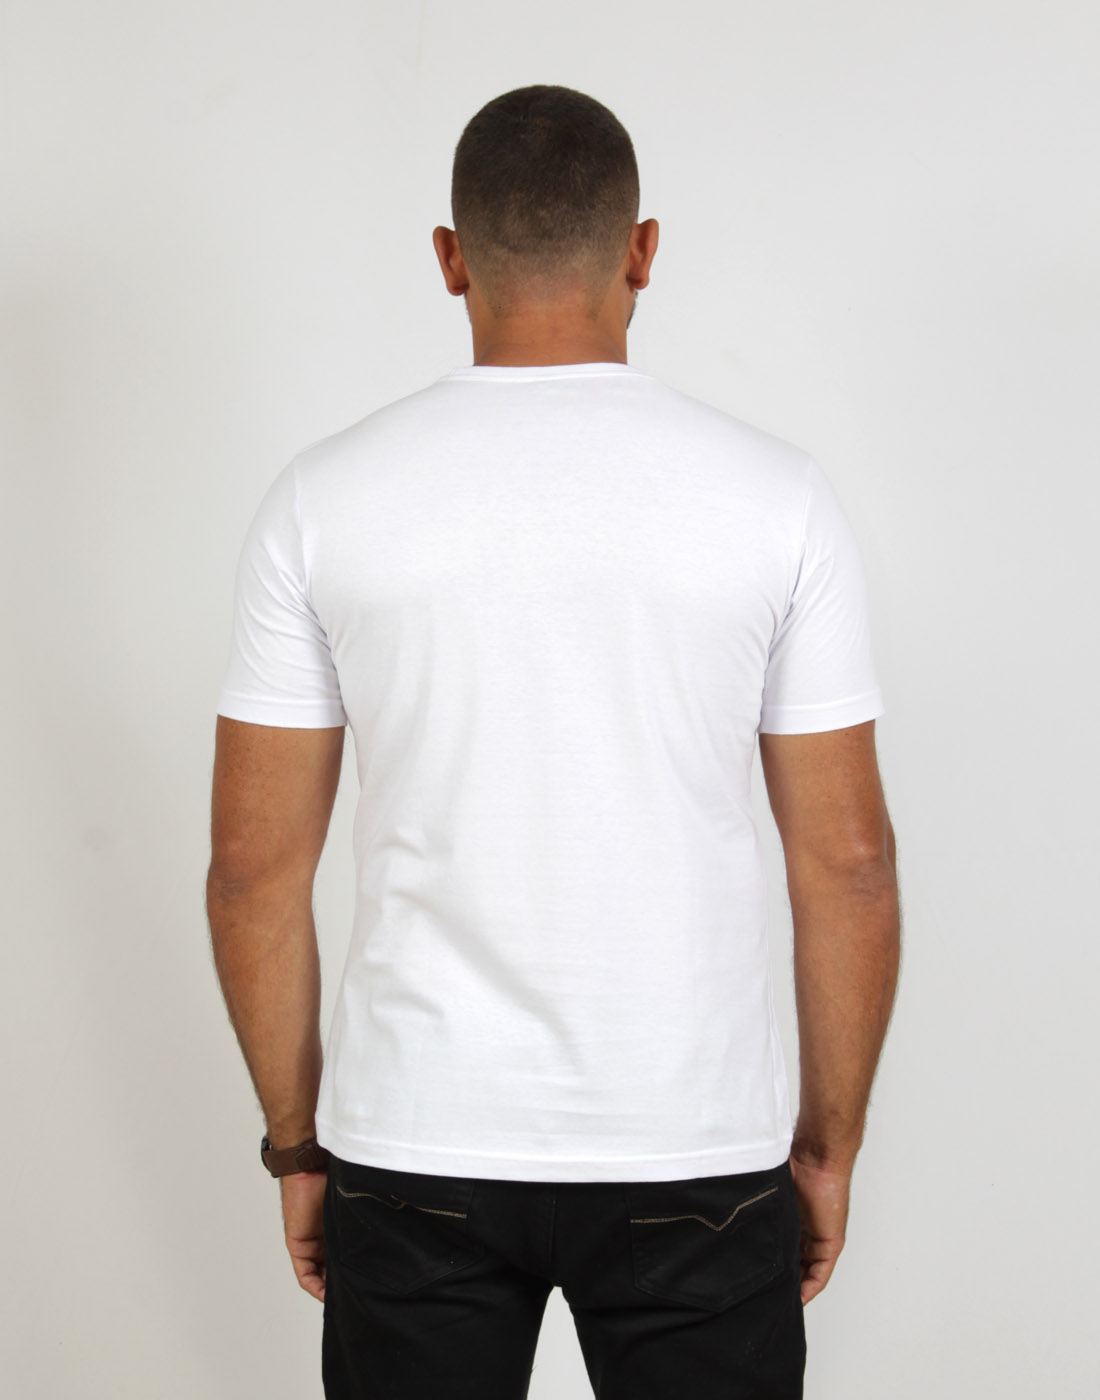 Camiseta Masc. Fashion Basic Branco Fatal